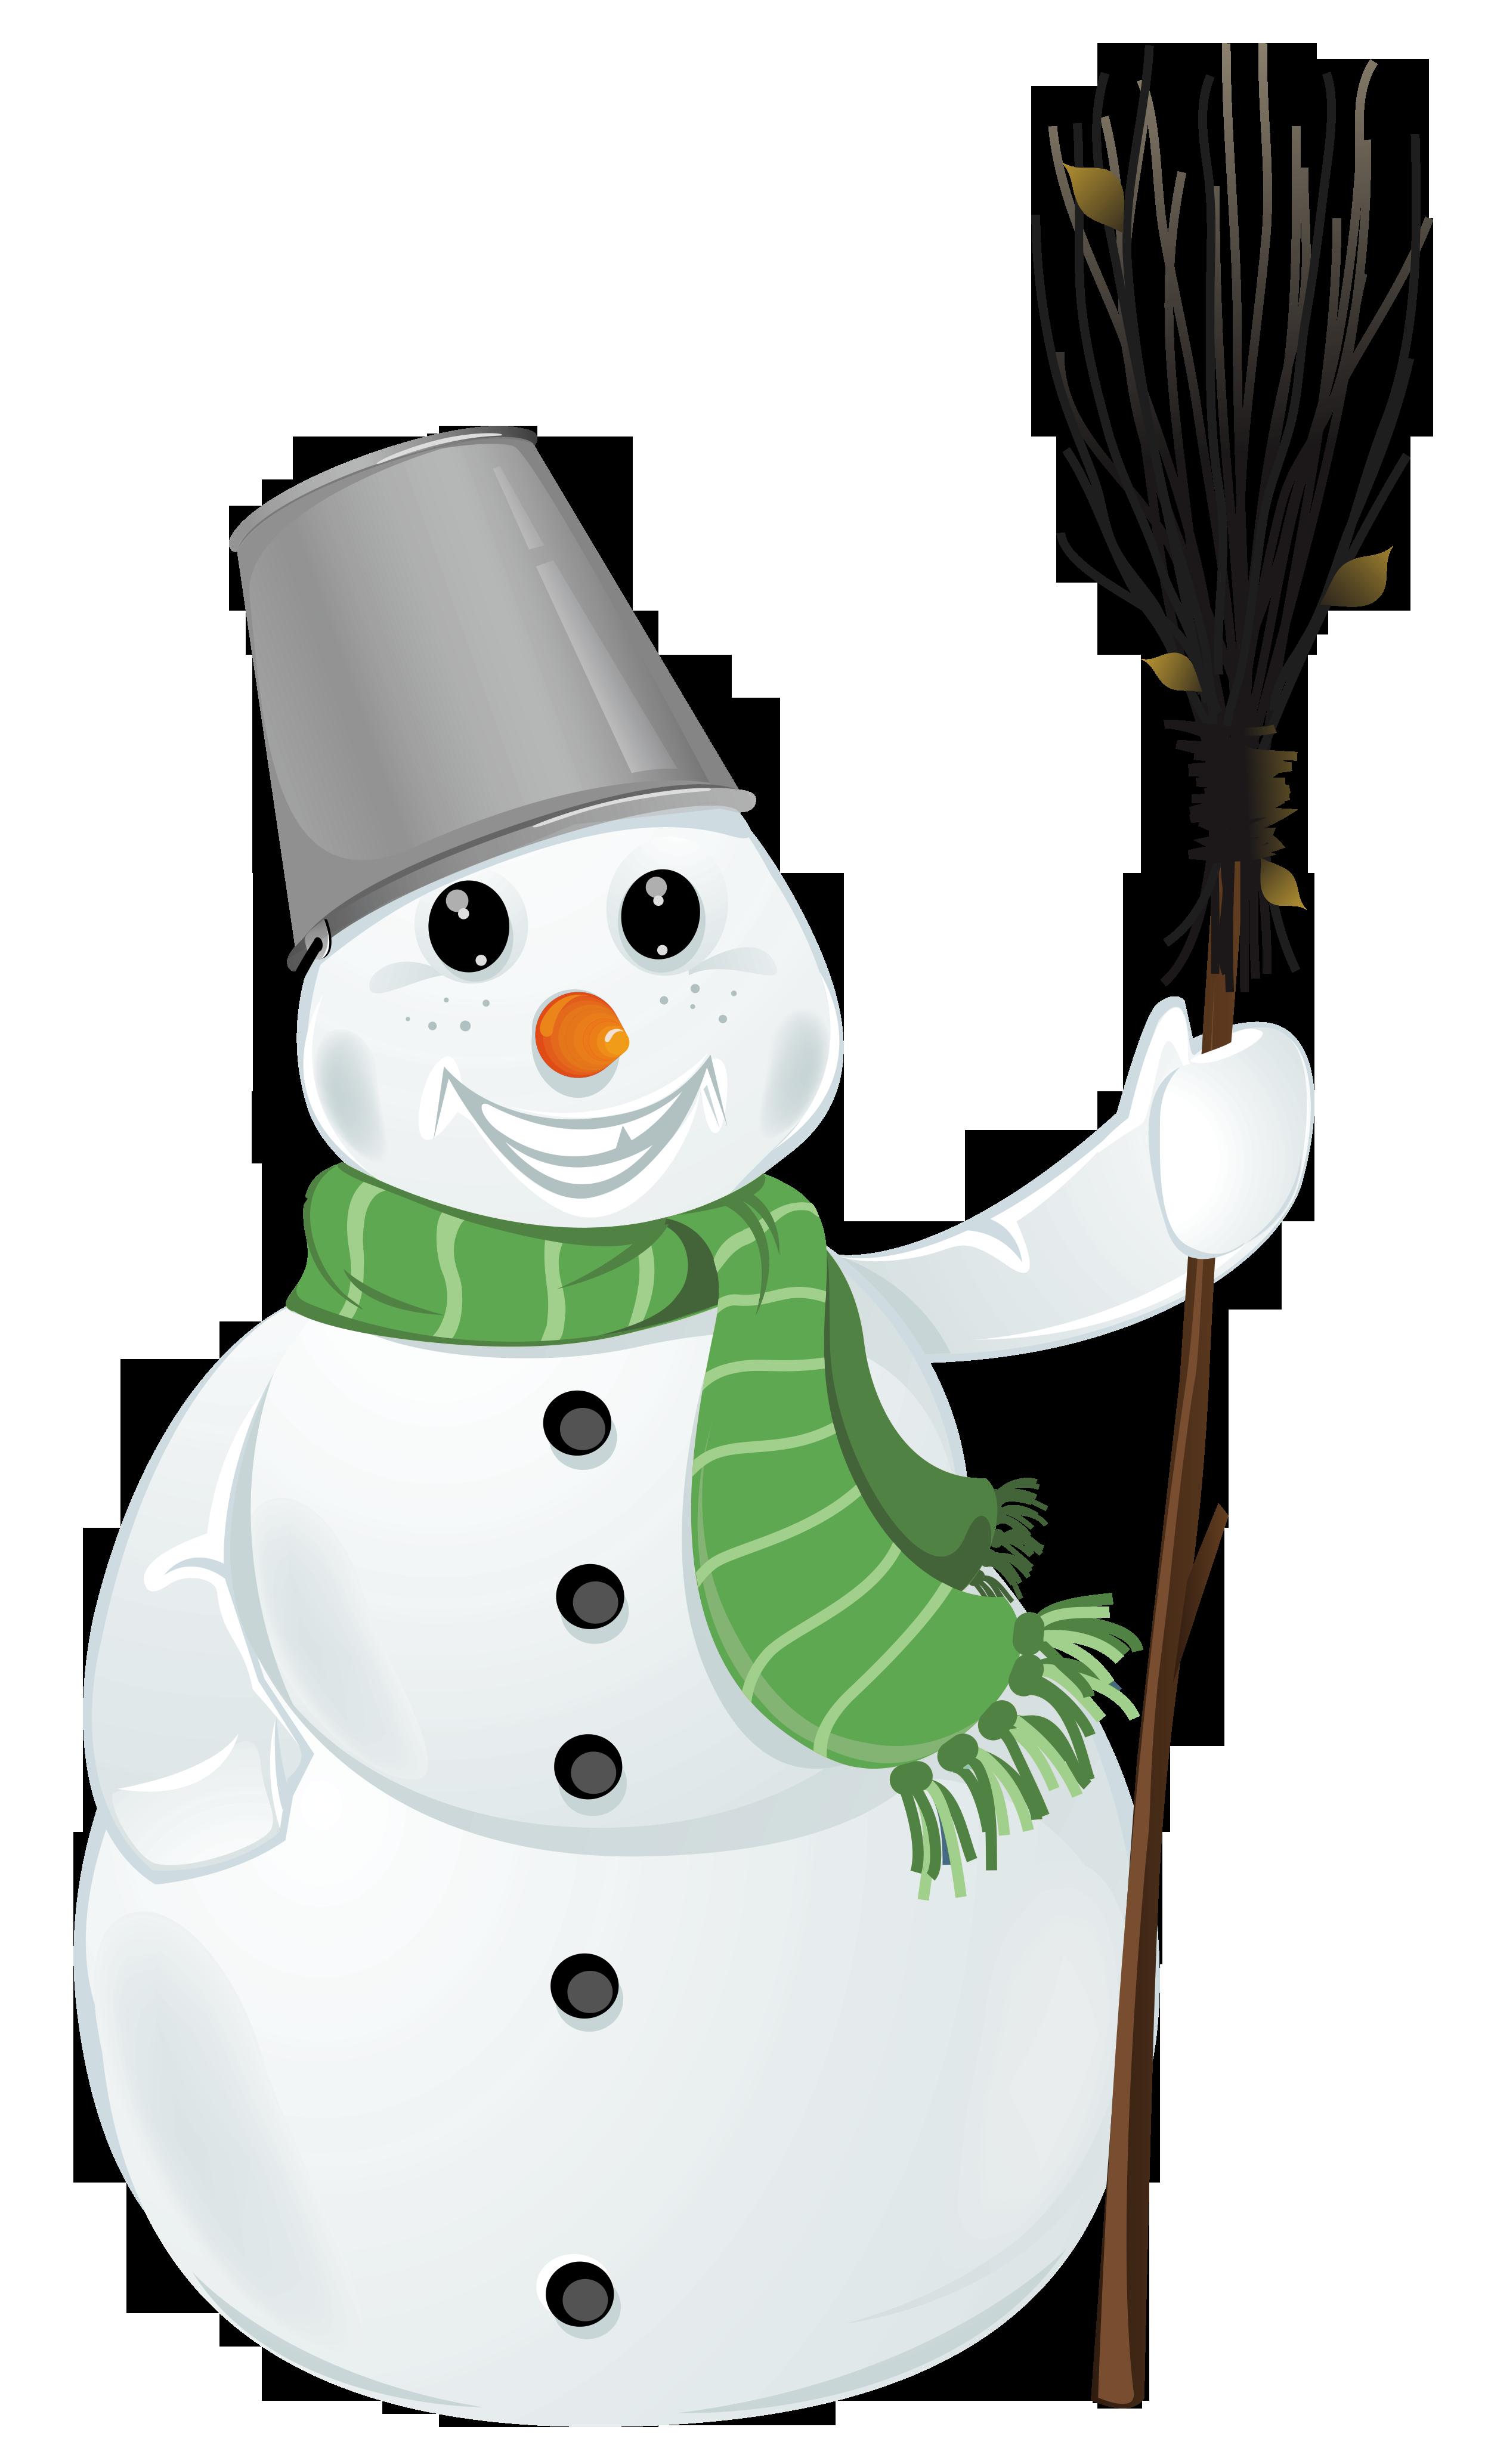 Snowman clipart green. Transparent gallery yopriceville high